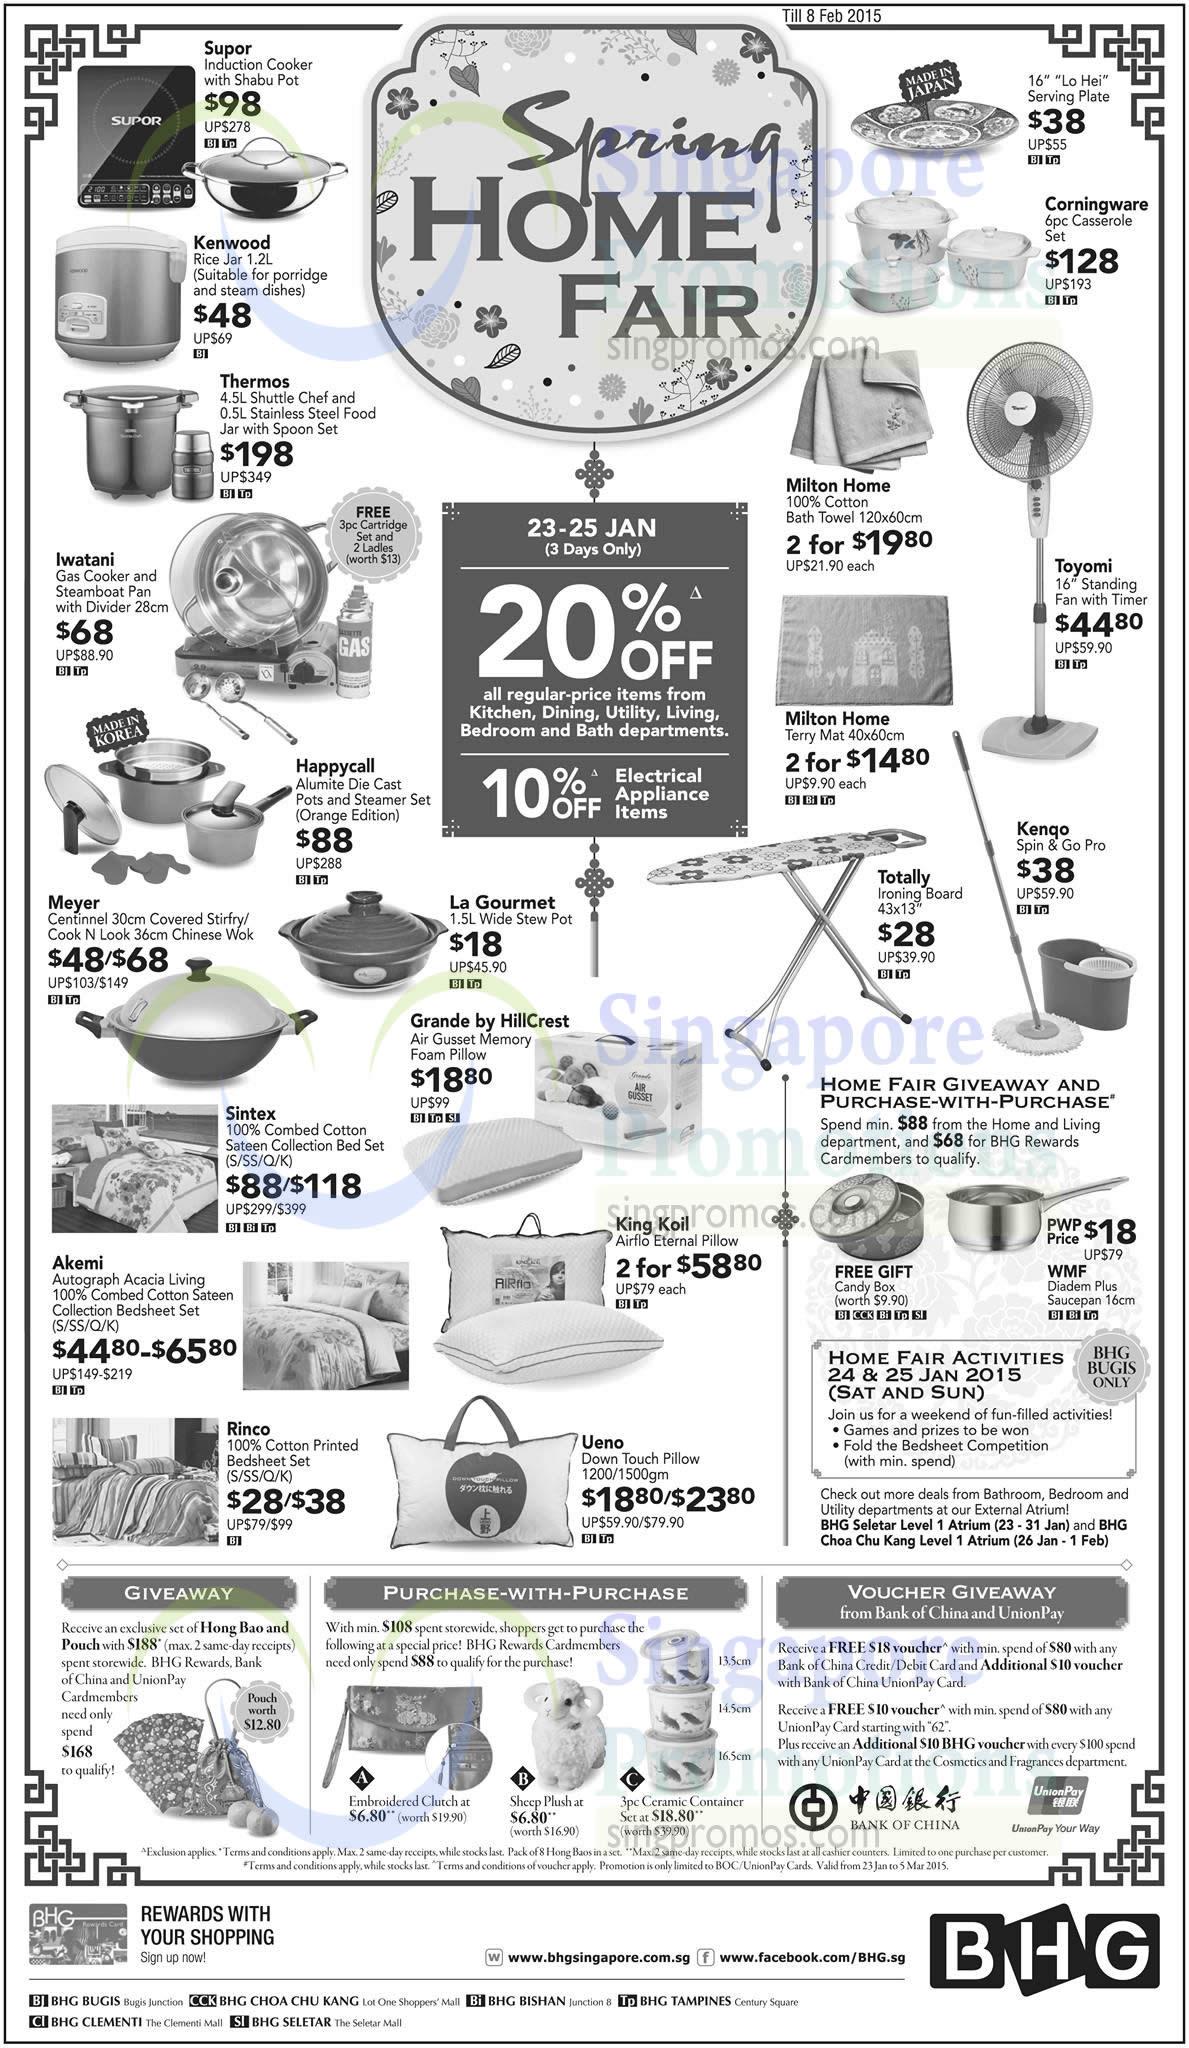 Bhg 23 Jan 2015 Bhg 20 Off Home Living Items 23 25